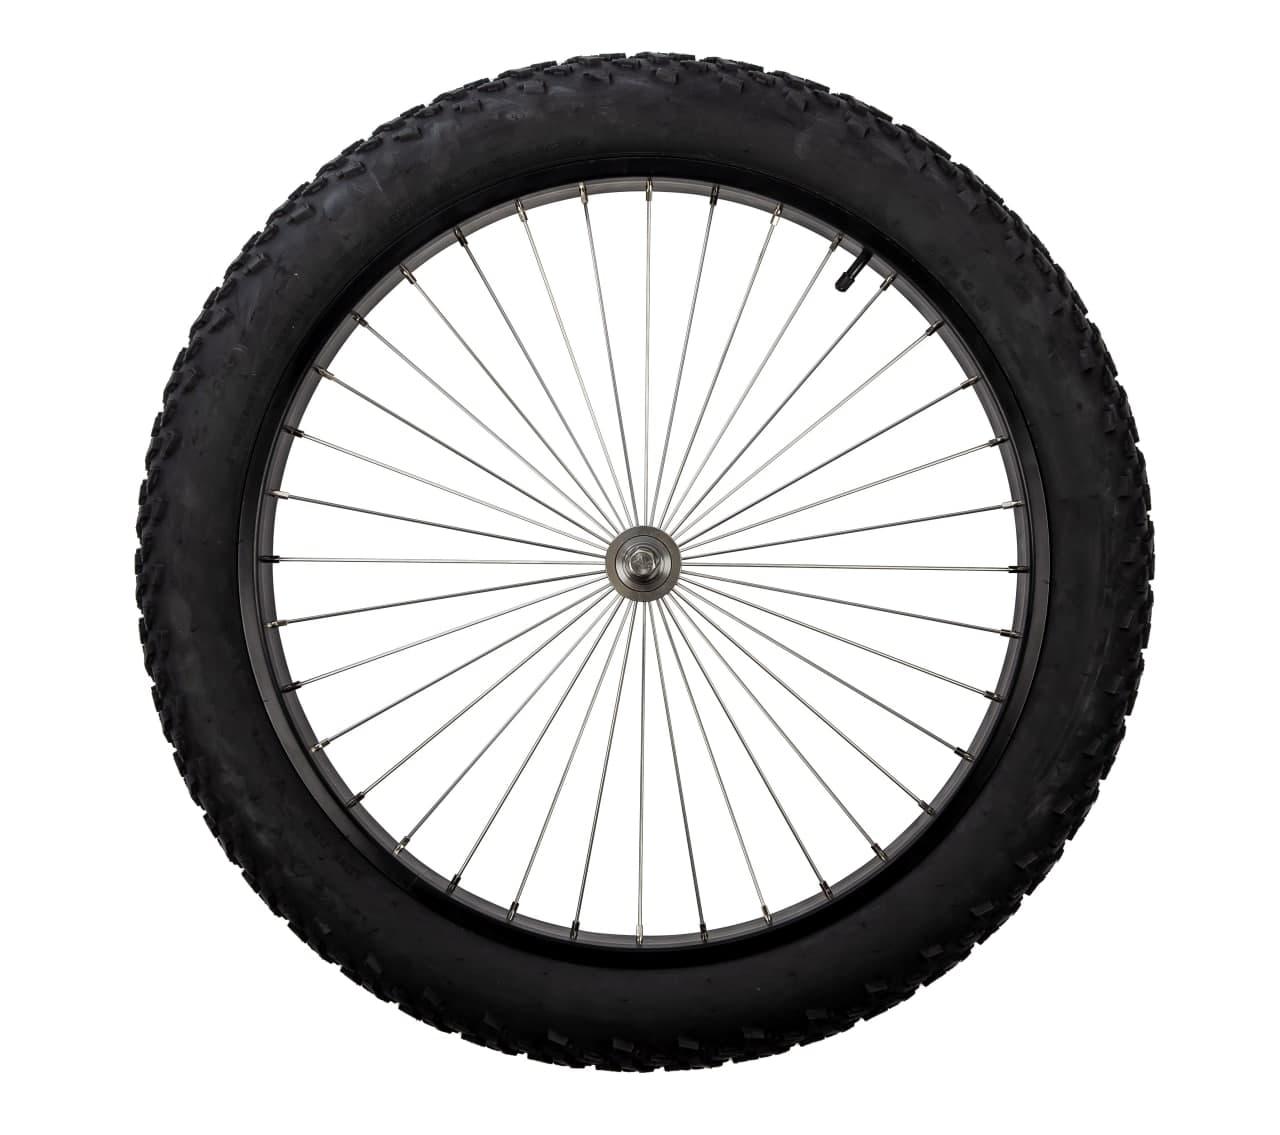 Tykt hjul 26″ for Rapid (stk)